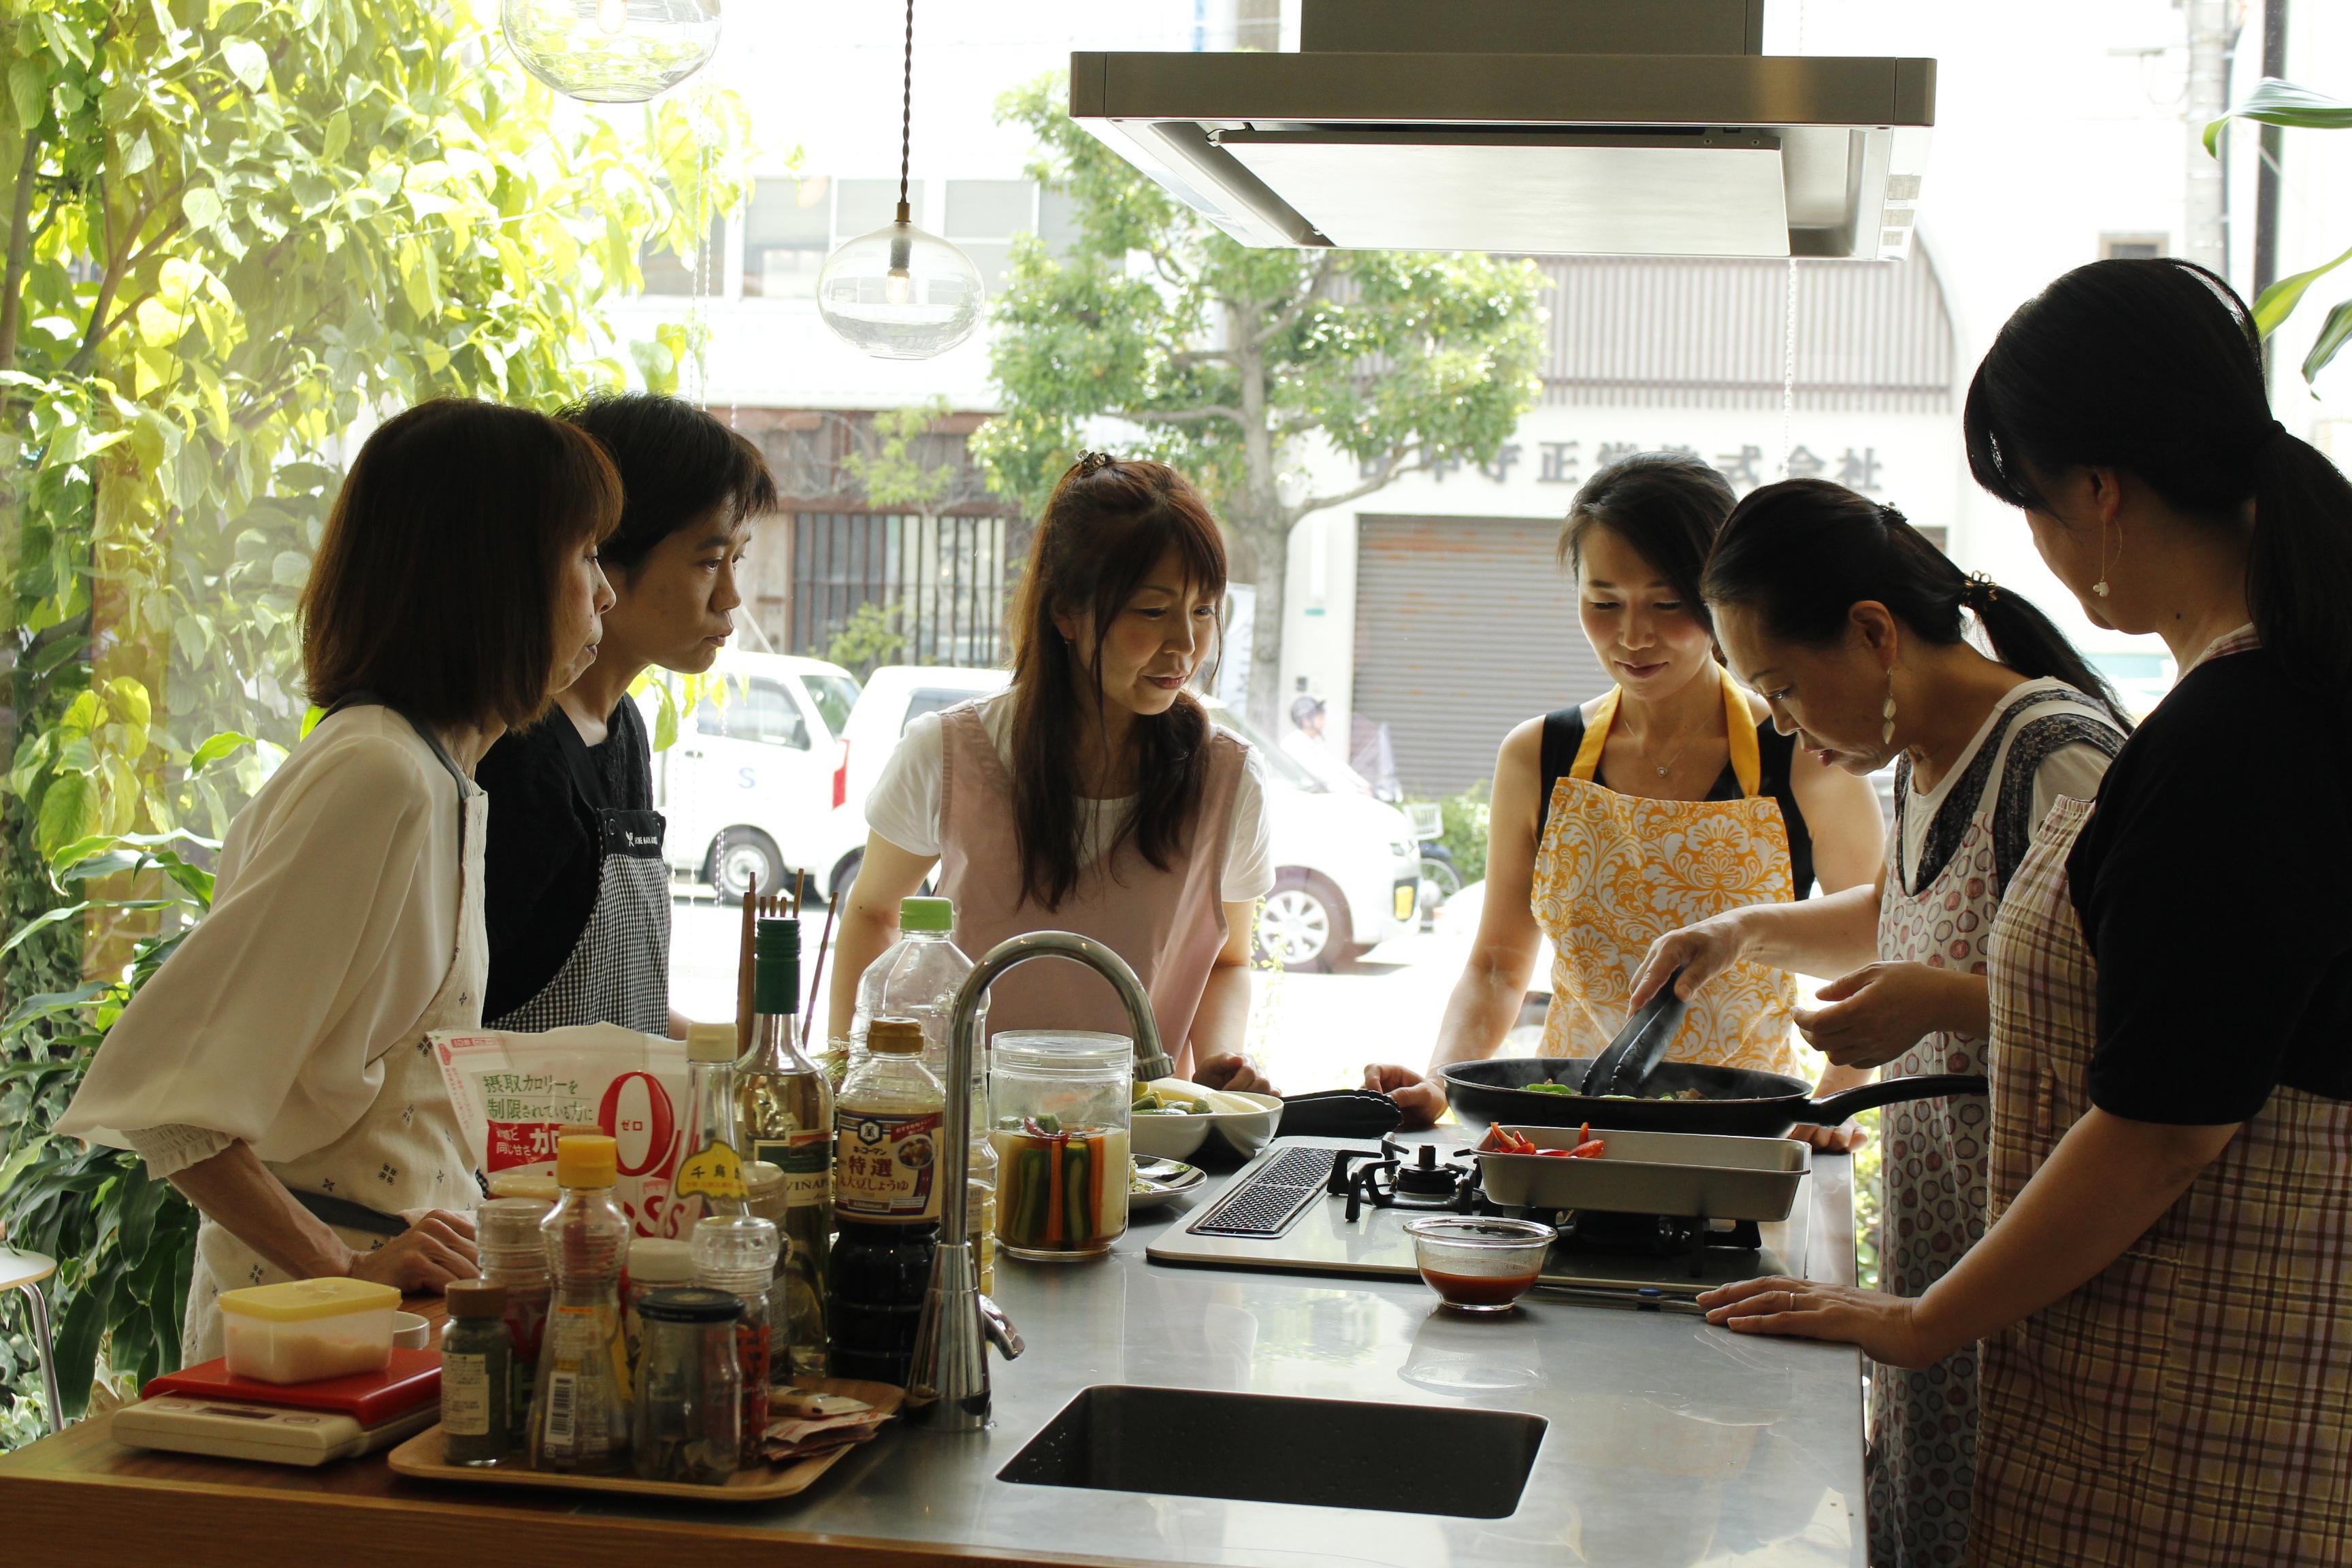 a-ta-sante糖質制限パン料理教室。8月度『糖質制限家庭料理教室』初日、大盛況で終了。阿倍野区西田辺。